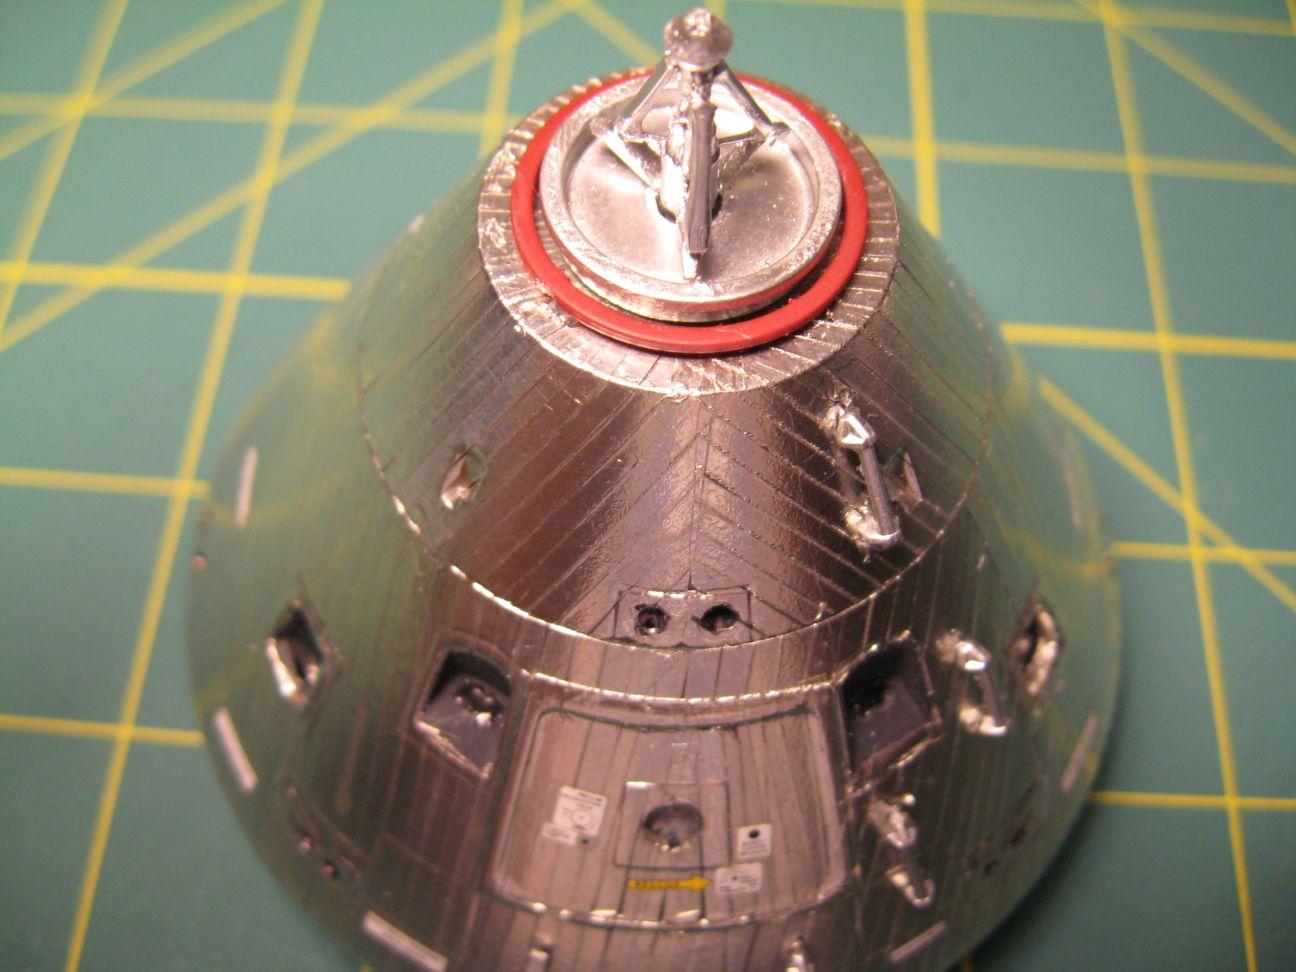 Ohio Valley Spaceport: Building Dragon's 1/48 Apollo CSM ...